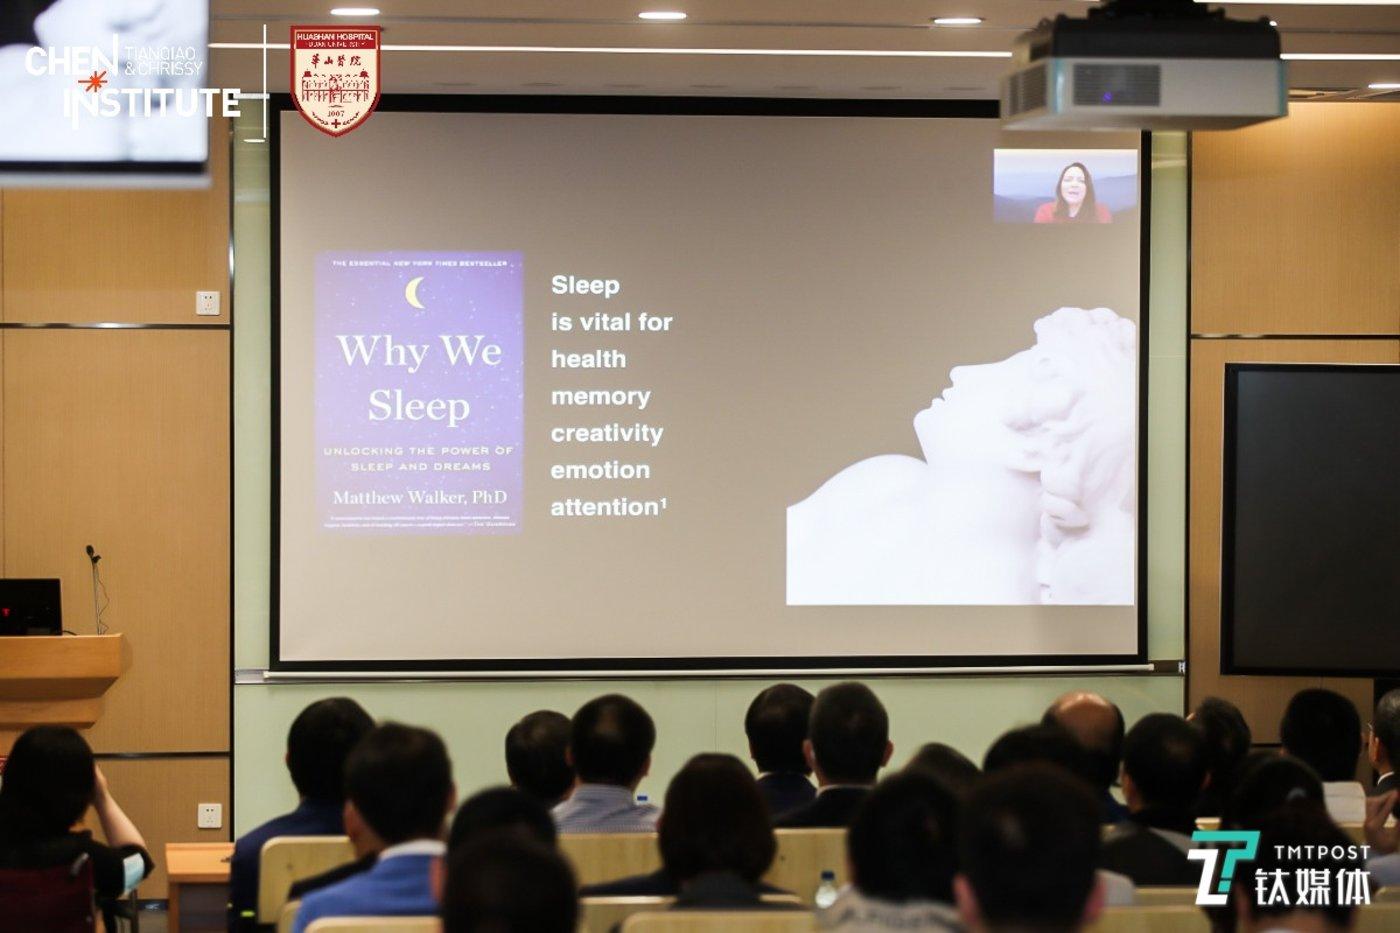 Pattie Maes教授视频展示并叙述梦境控制方面的研究成果